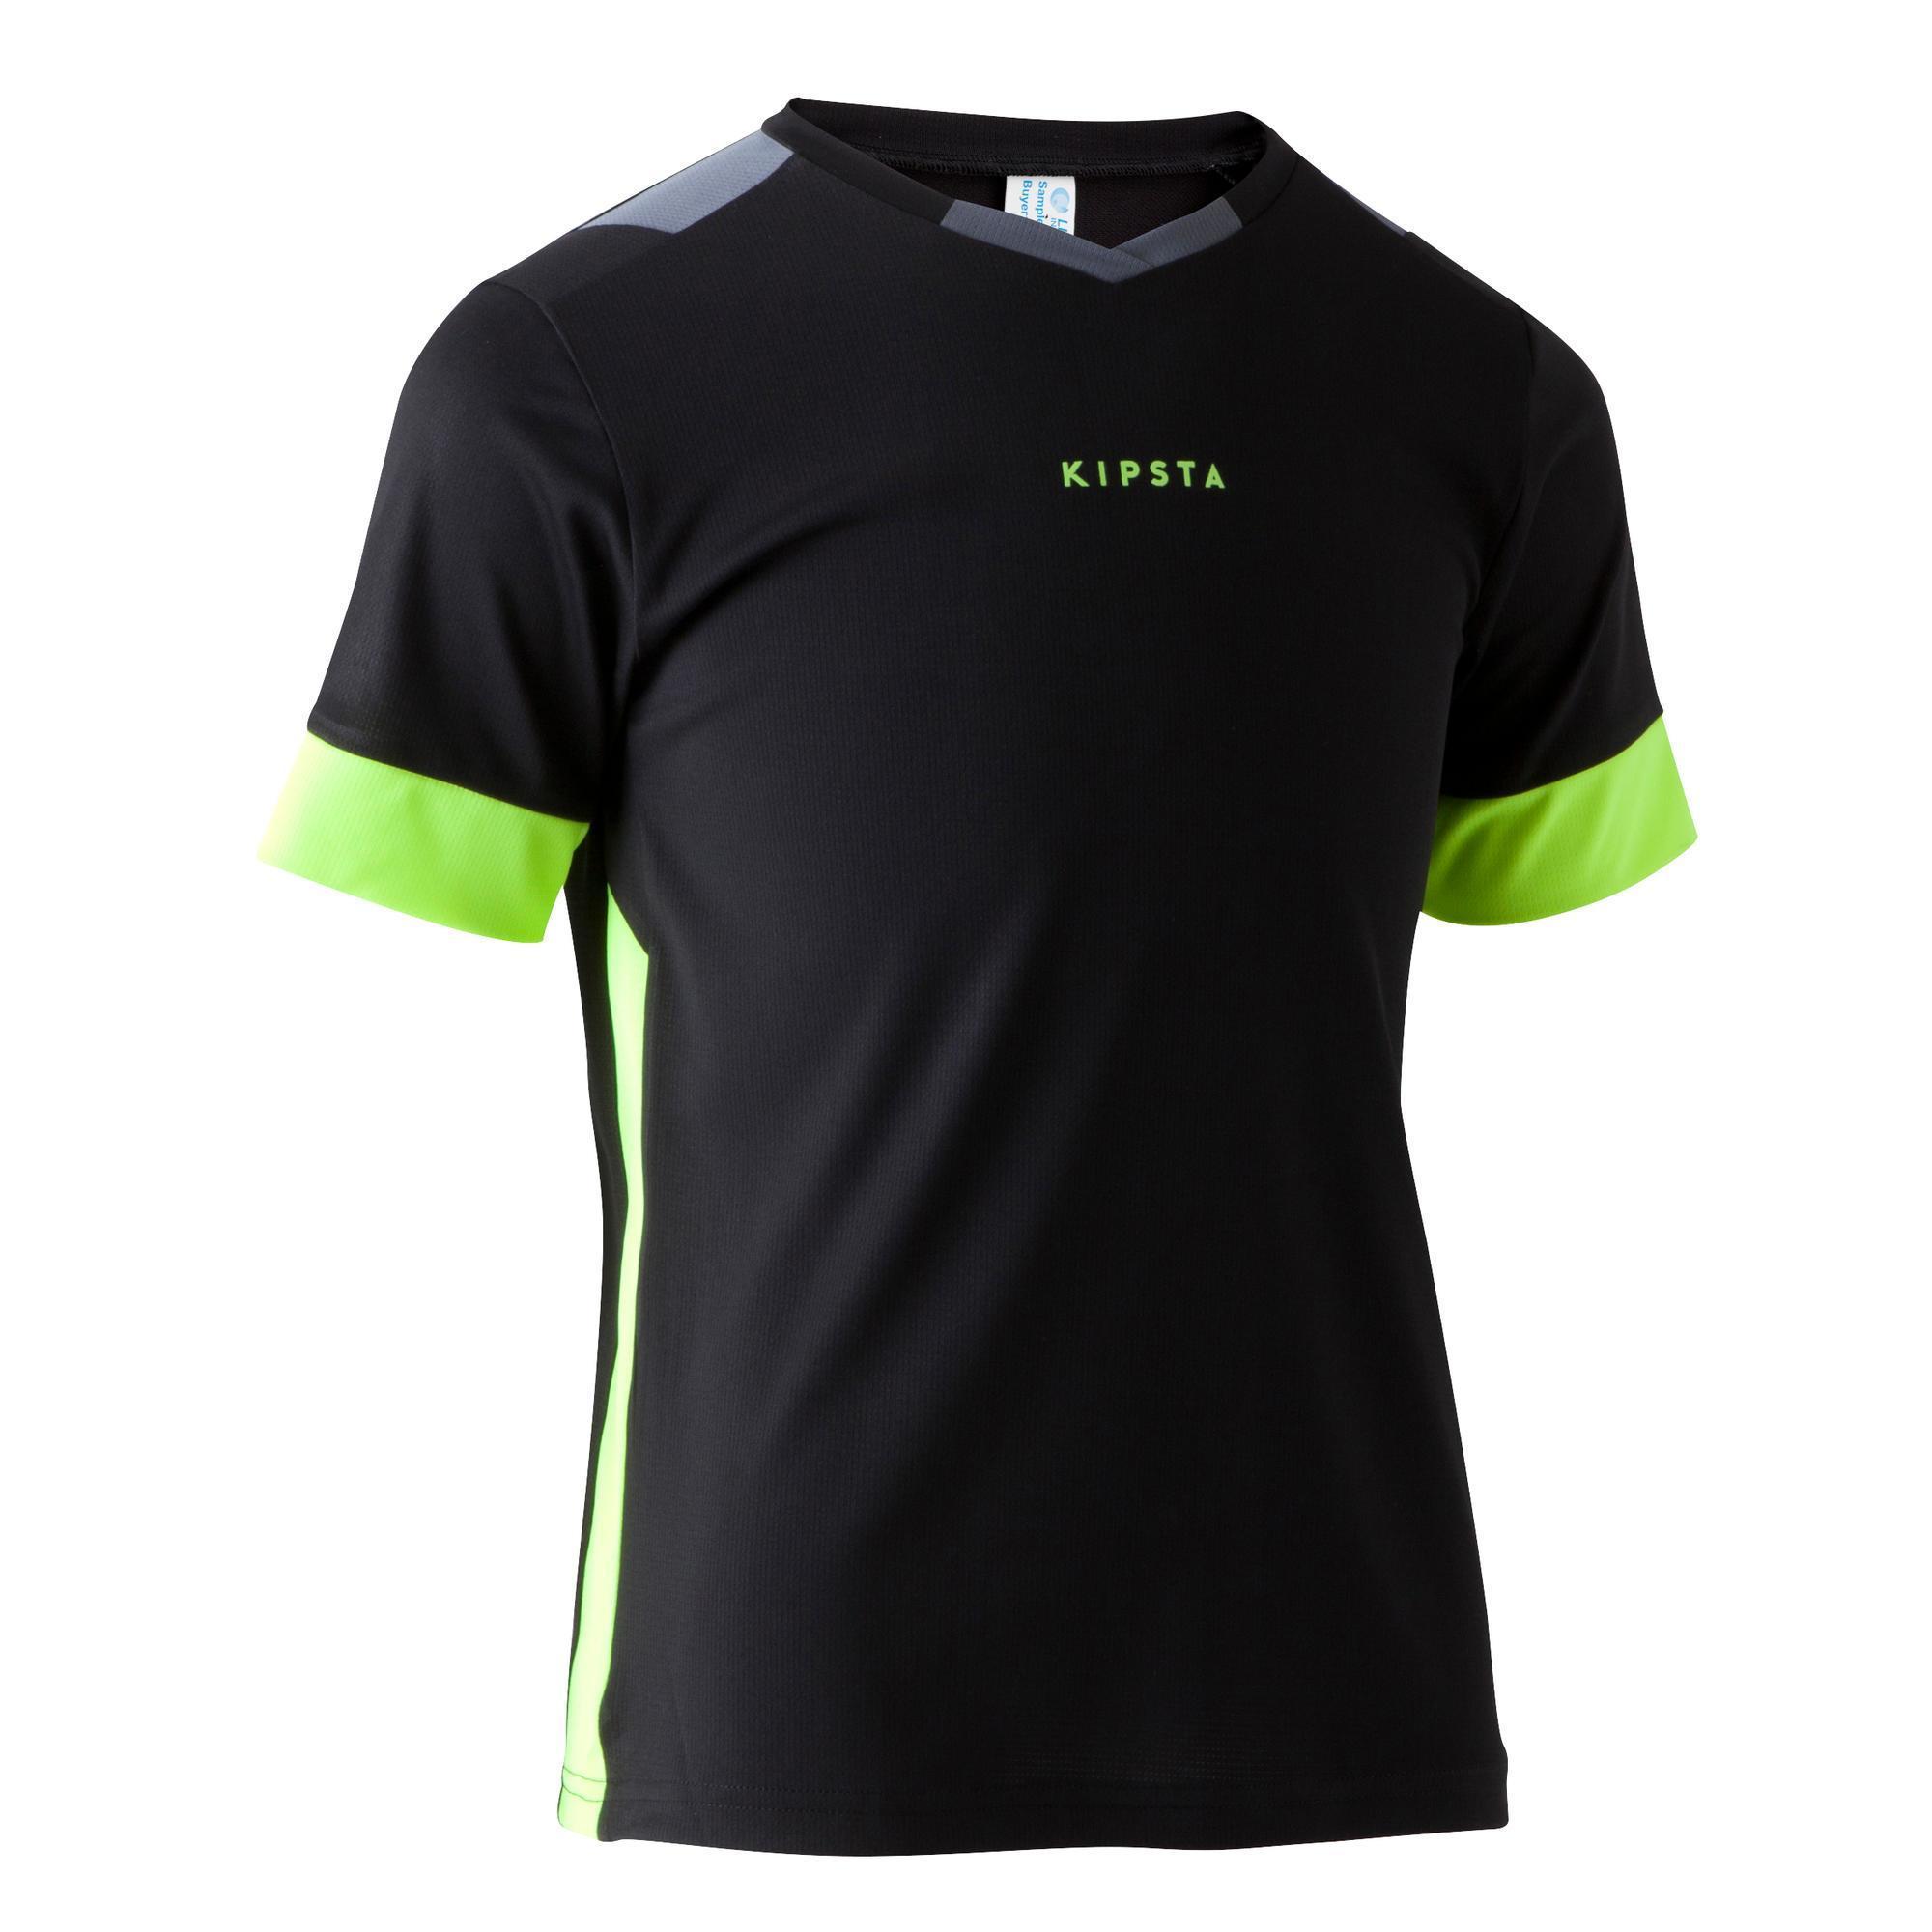 Kipsta Voetbalshirt kind F500 zwart